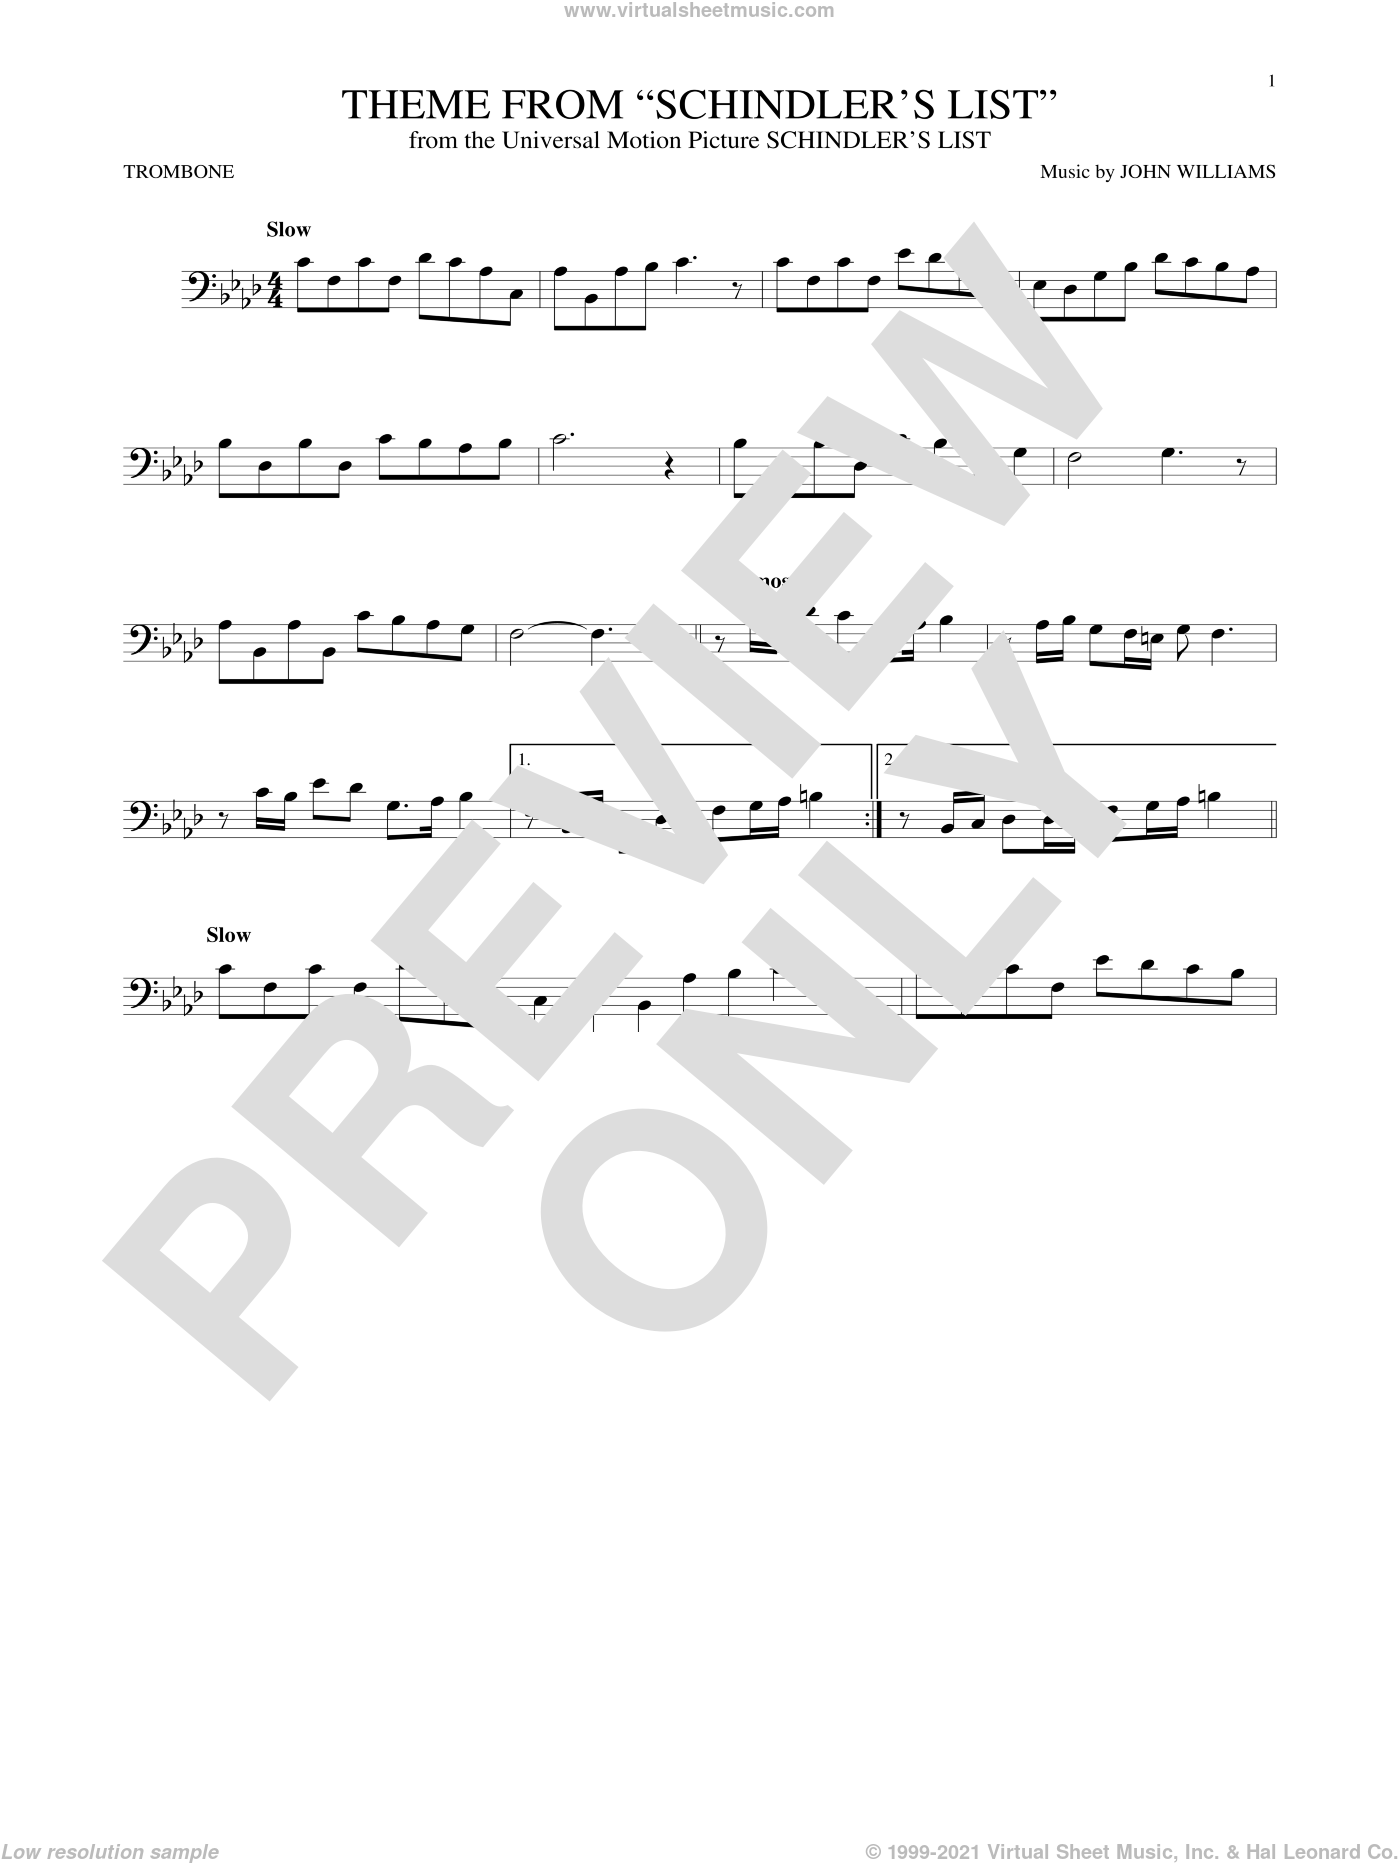 Theme From Schindler's List sheet music for trombone solo by John Williams, intermediate skill level